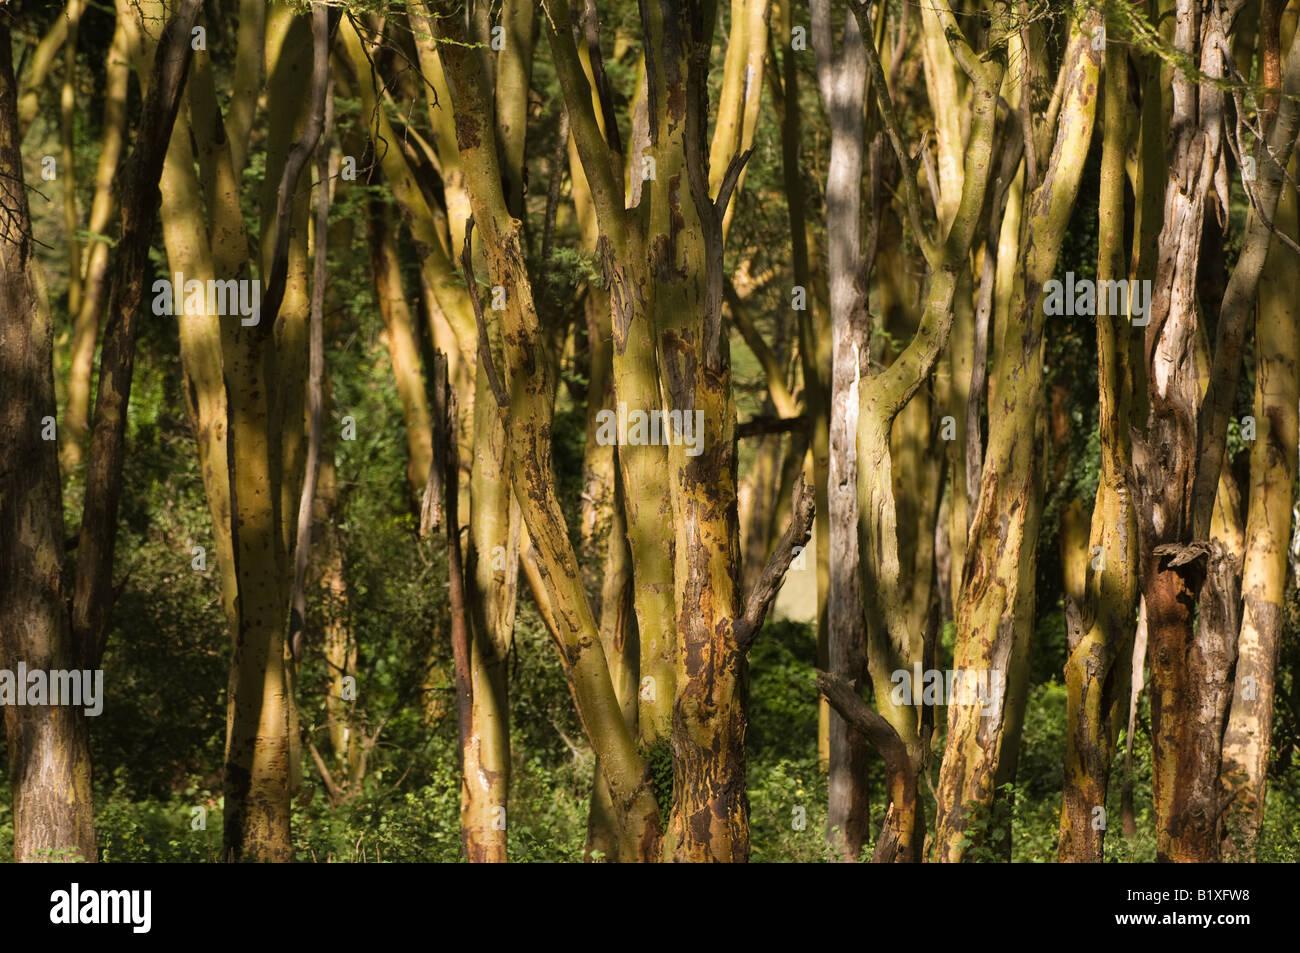 Yellow barked acacias trees - Stock Image